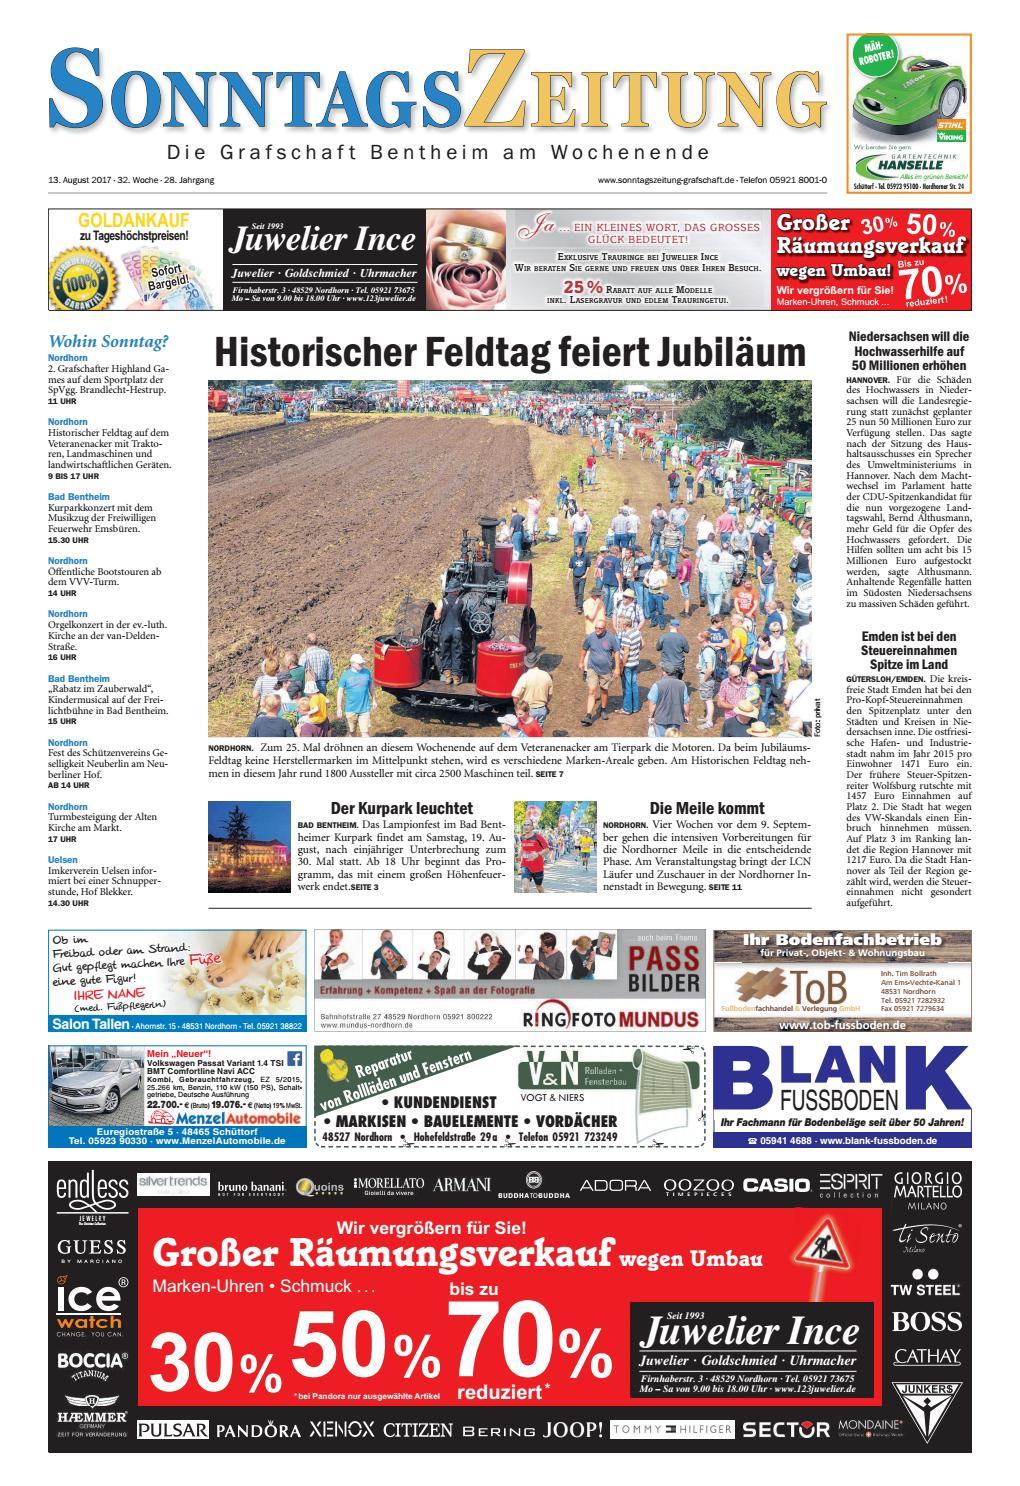 SonntagsZeitung_13-8-2017 by SonntagsZeitung - issuu